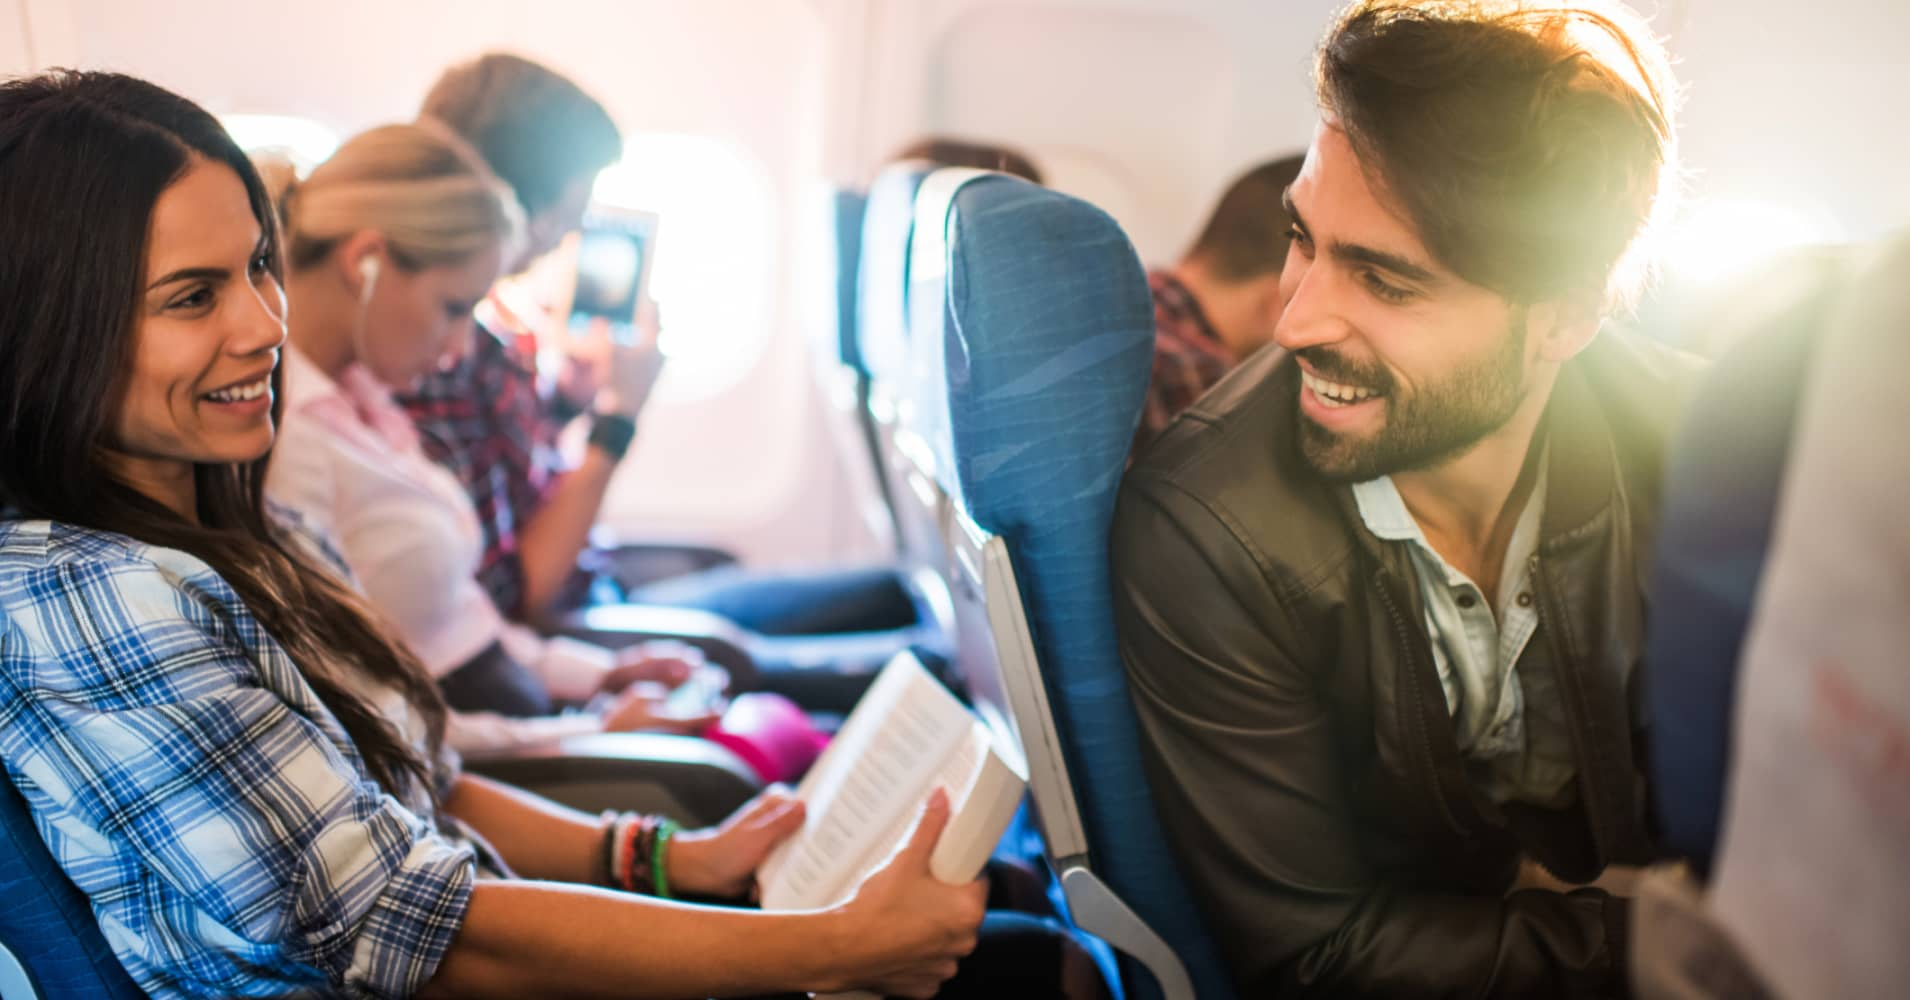 cheap gas, lower airfares will spike summer travel